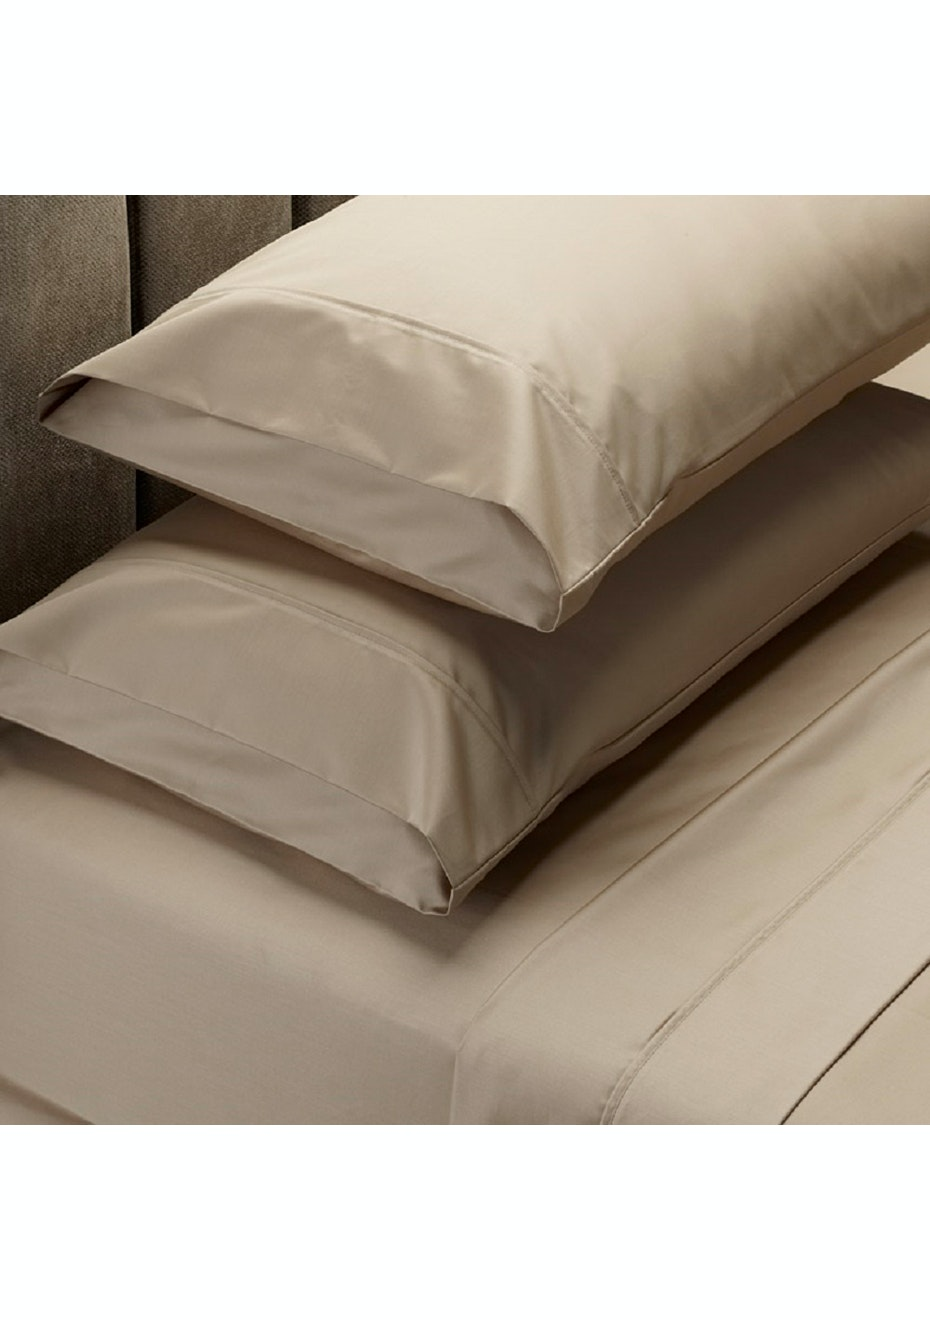 Park Avenue 1000 Thread Count 100% Egyptian Cotton Sheet Sets King - Oatmeal